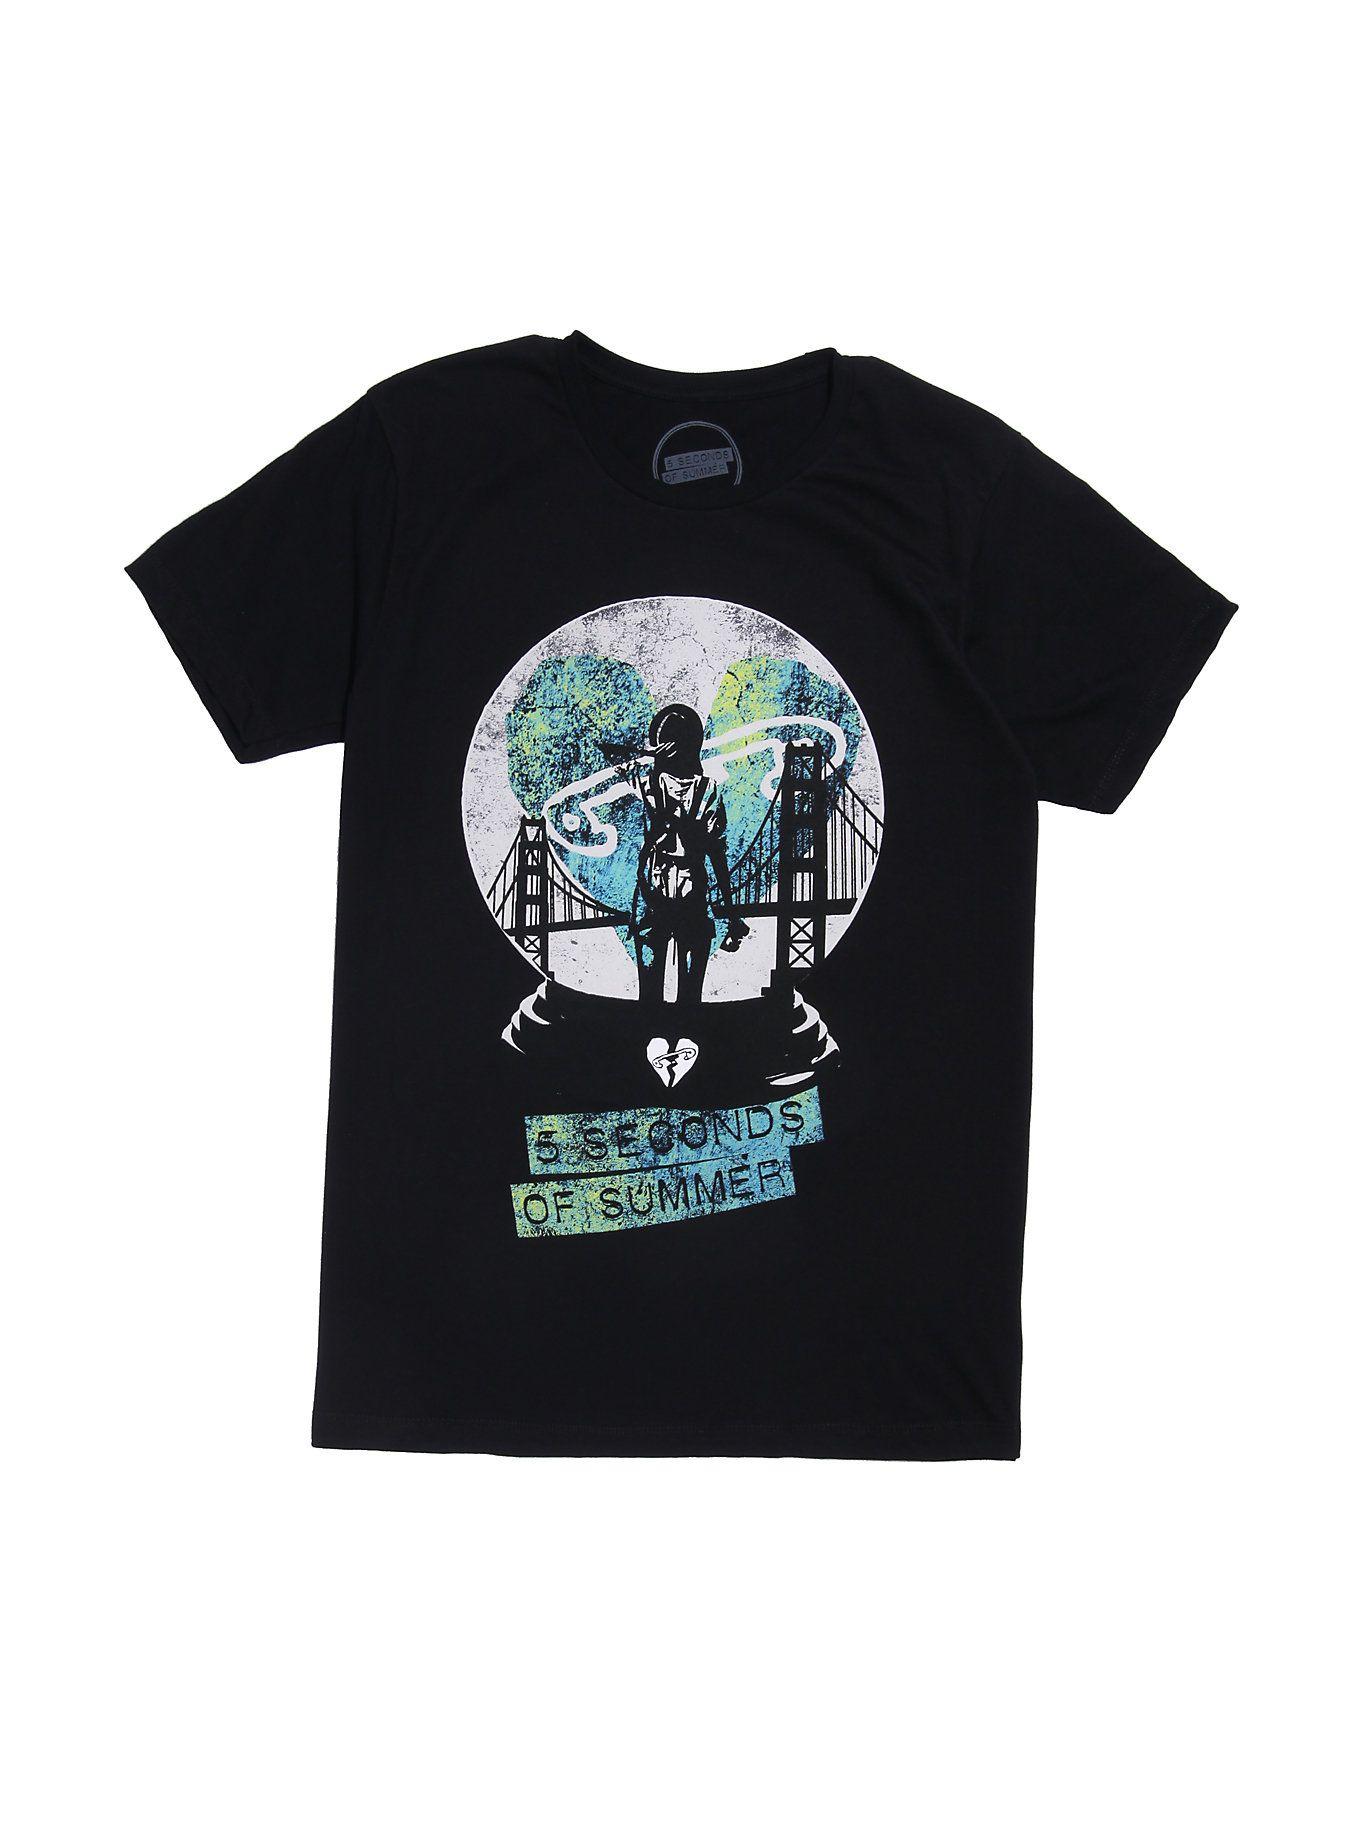 5 Seconds Of Summer Snow Globe T Shirt Band Merch 5 Seconds Of